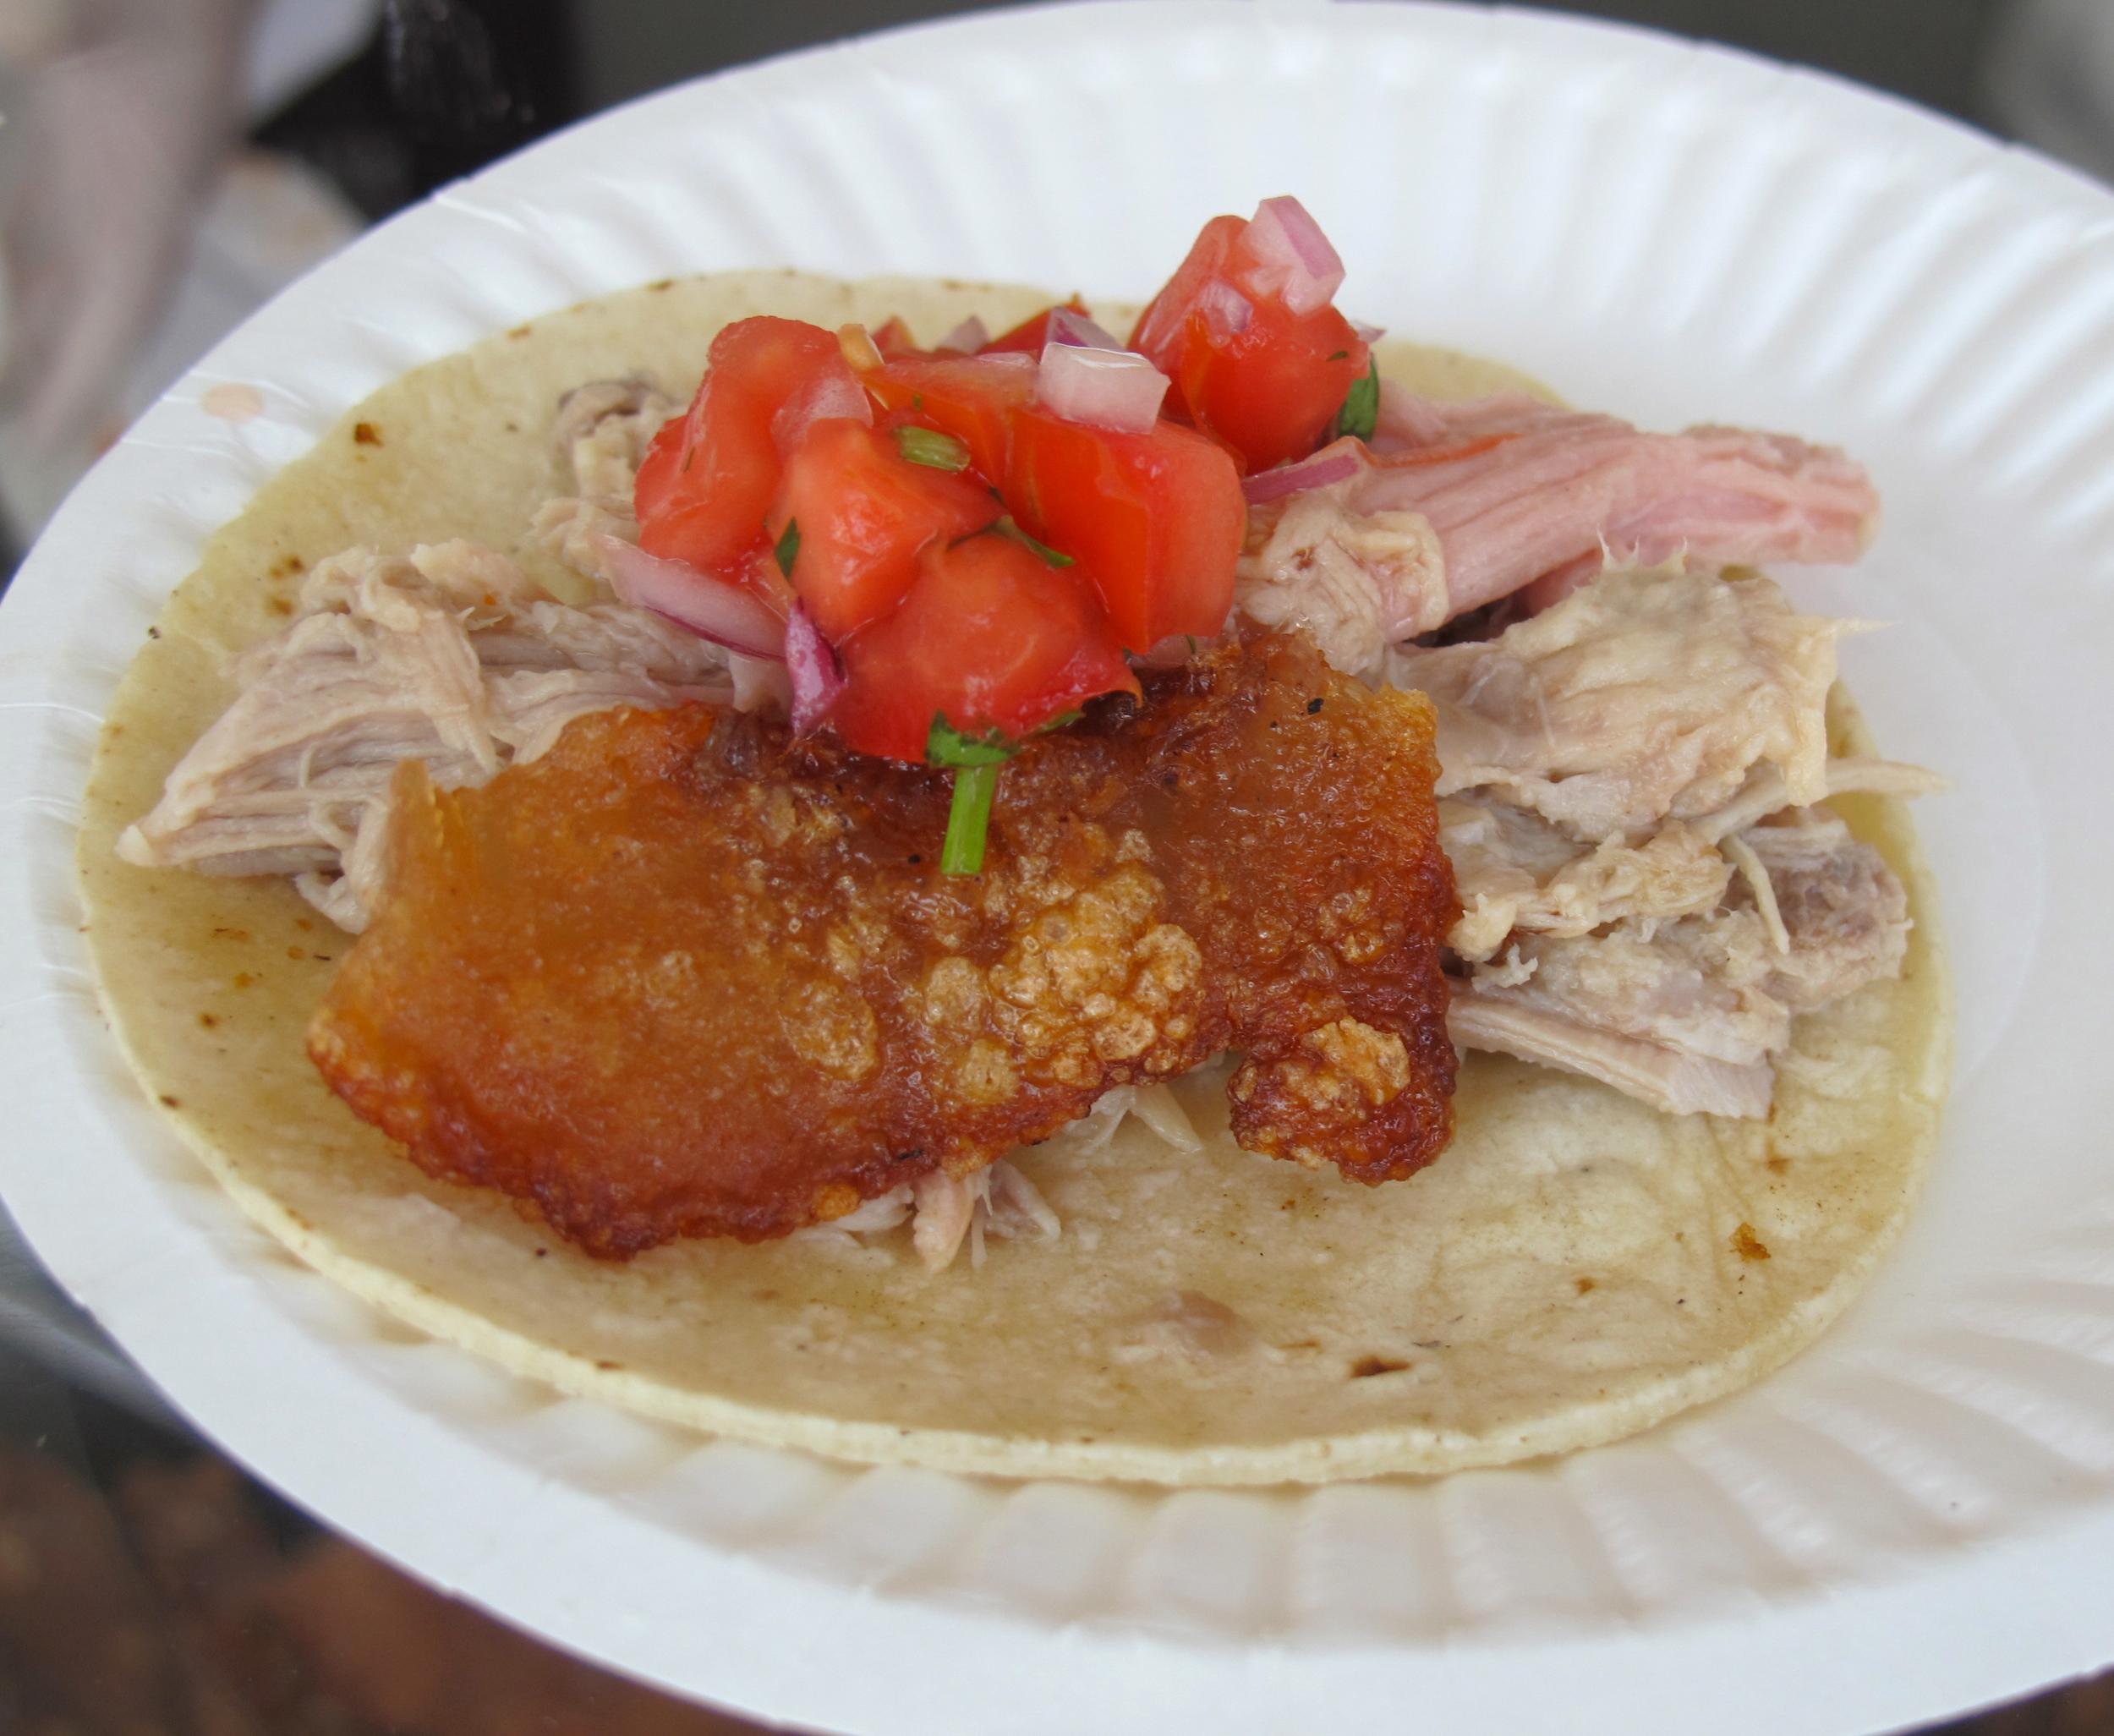 Chichen Iza's pork tacos